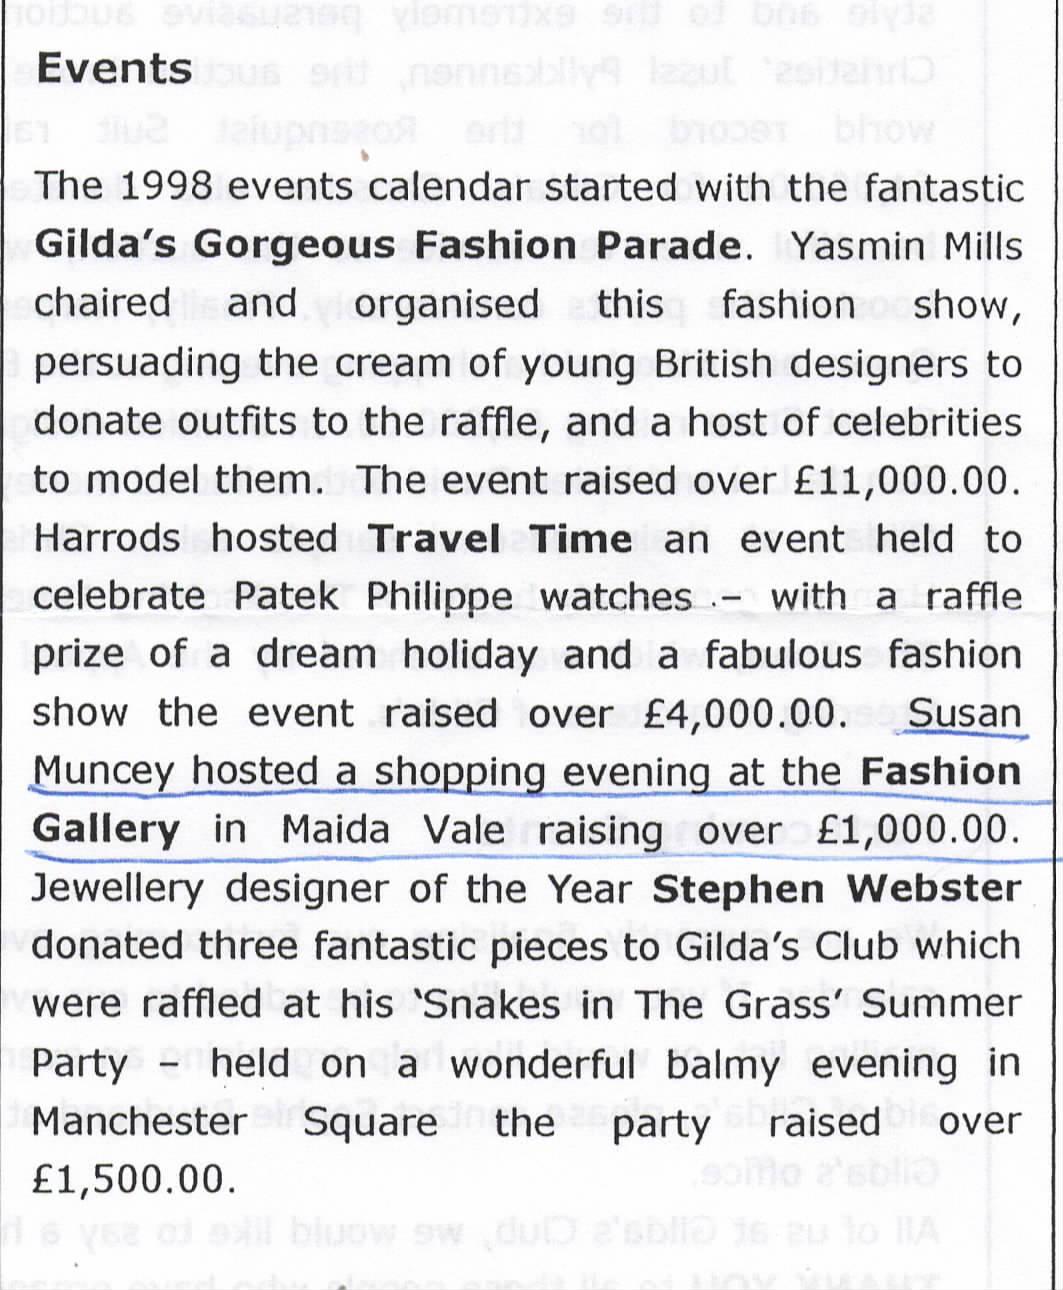 Fashion Gallery fund raising event for Gildas Club London.jpeg